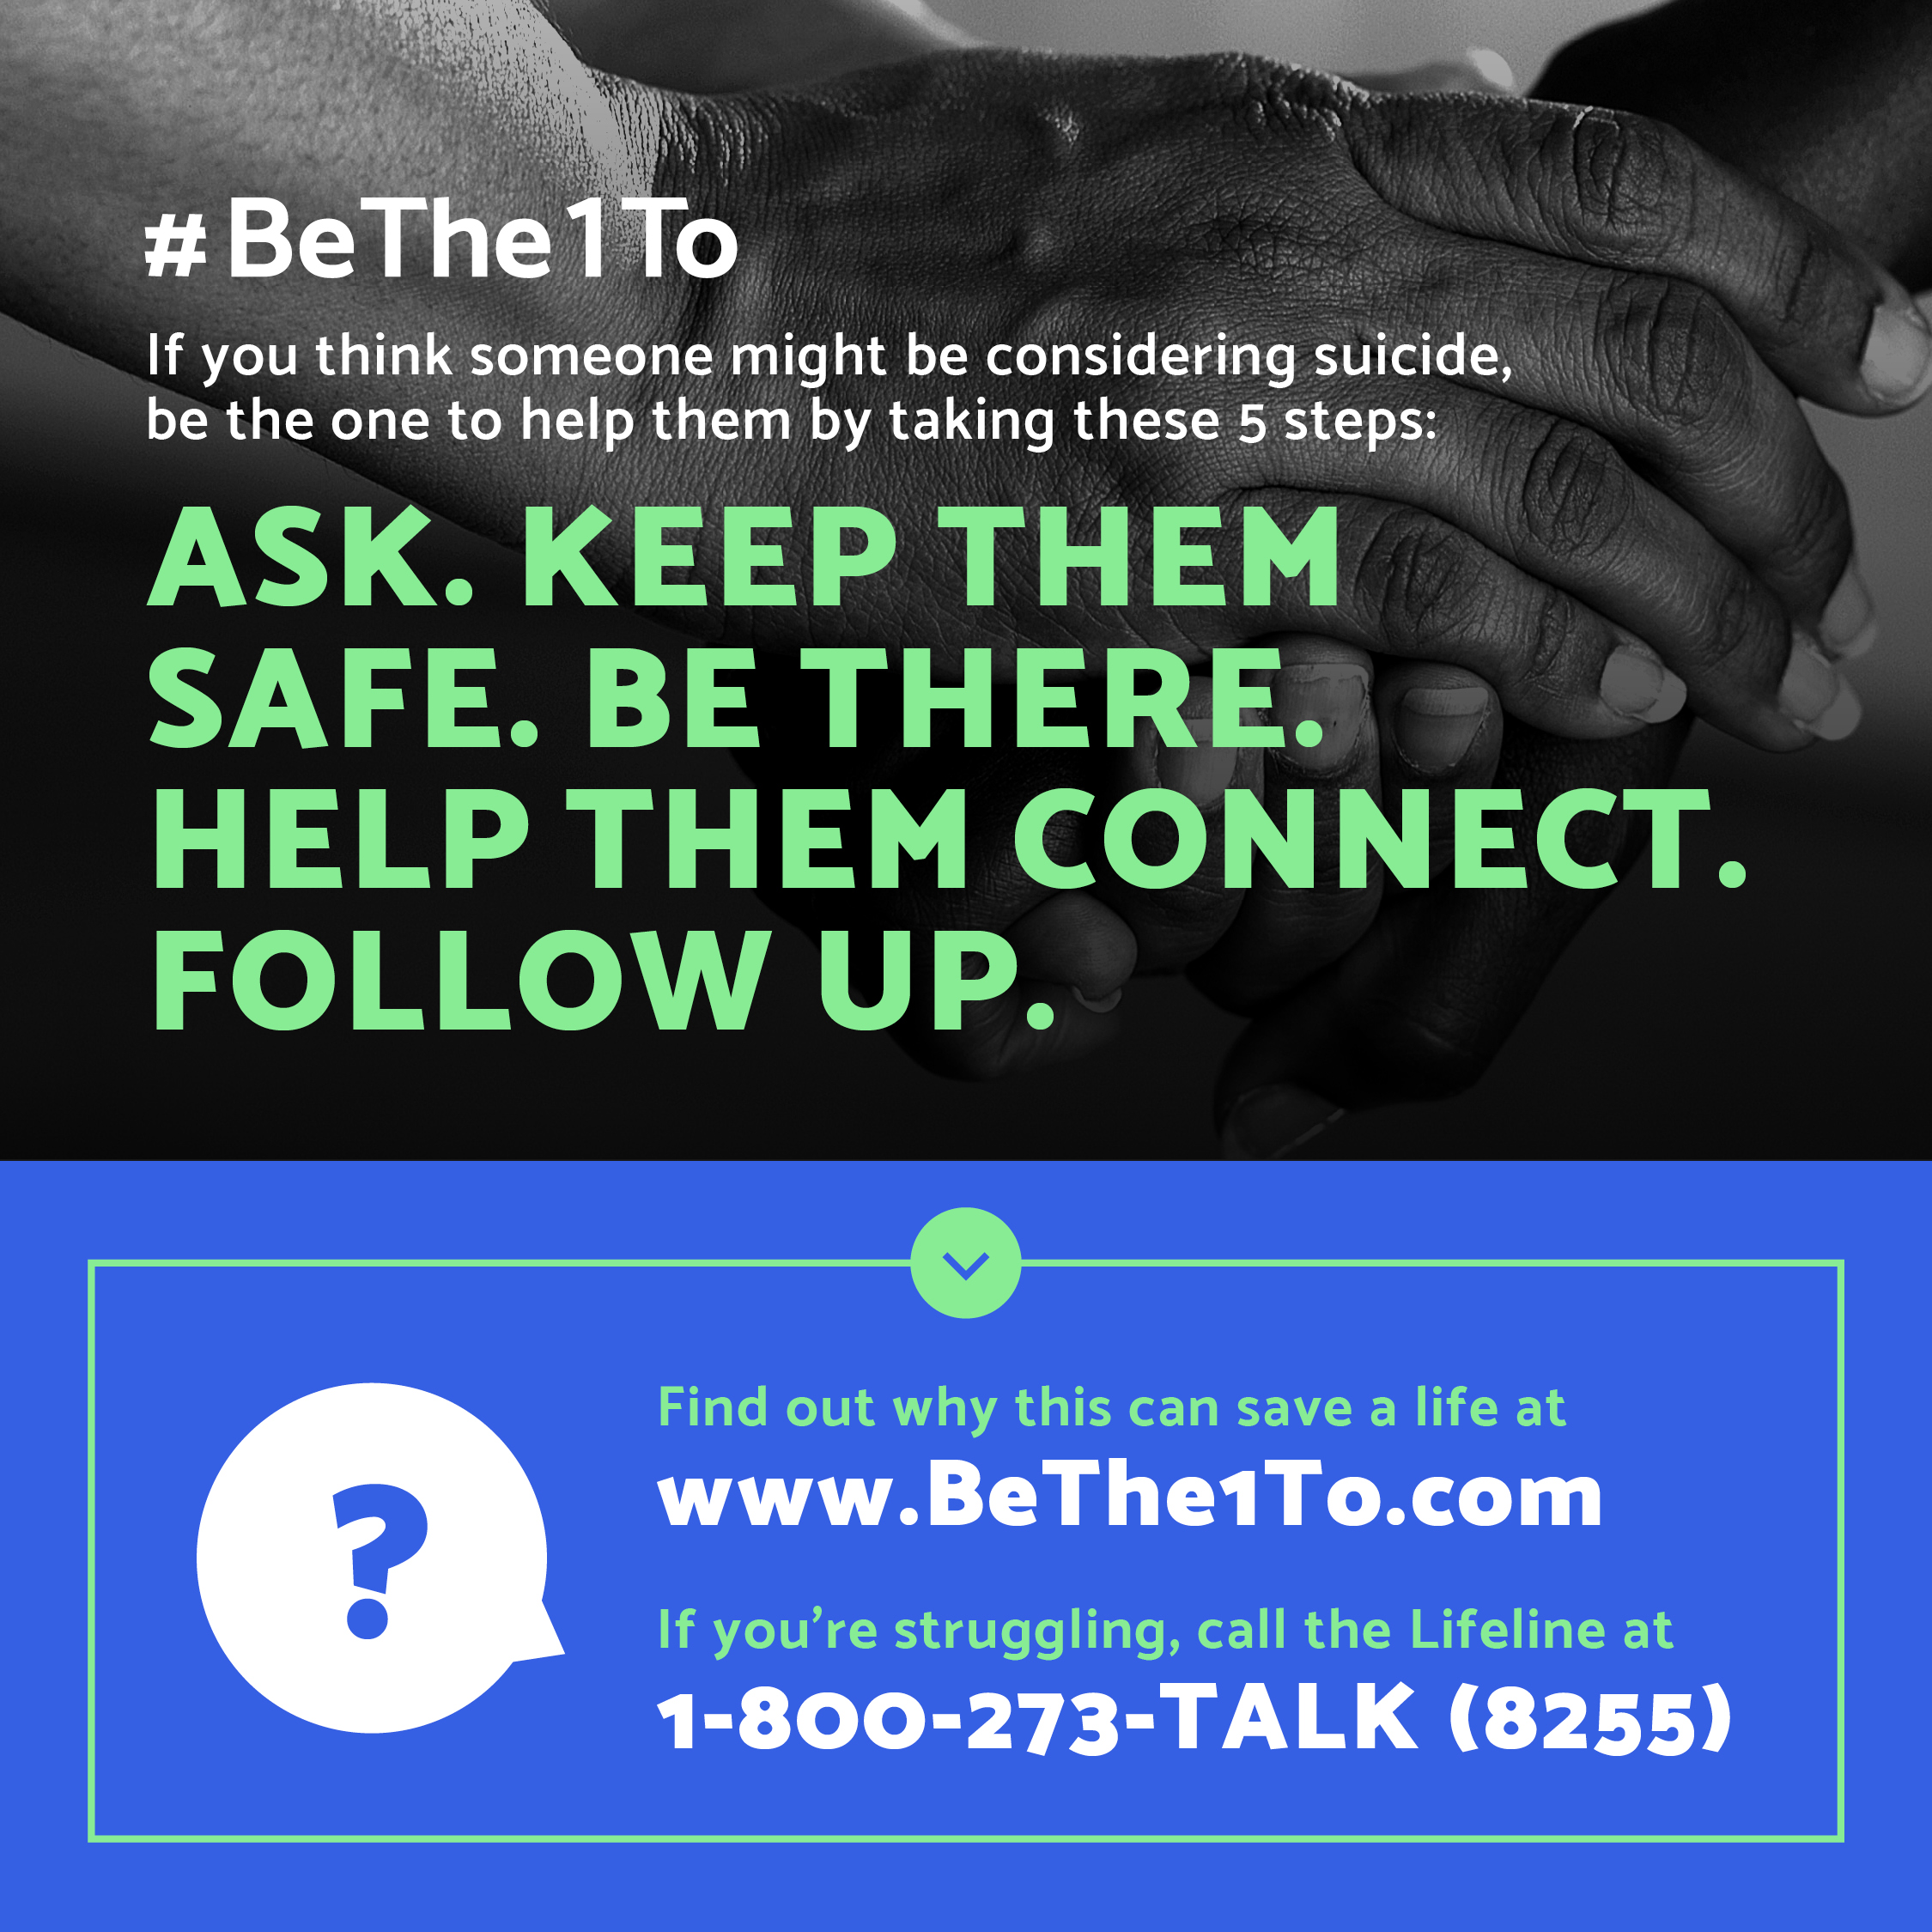 BeThe1To_Lifeline-SocialMedia_201707276.jpg